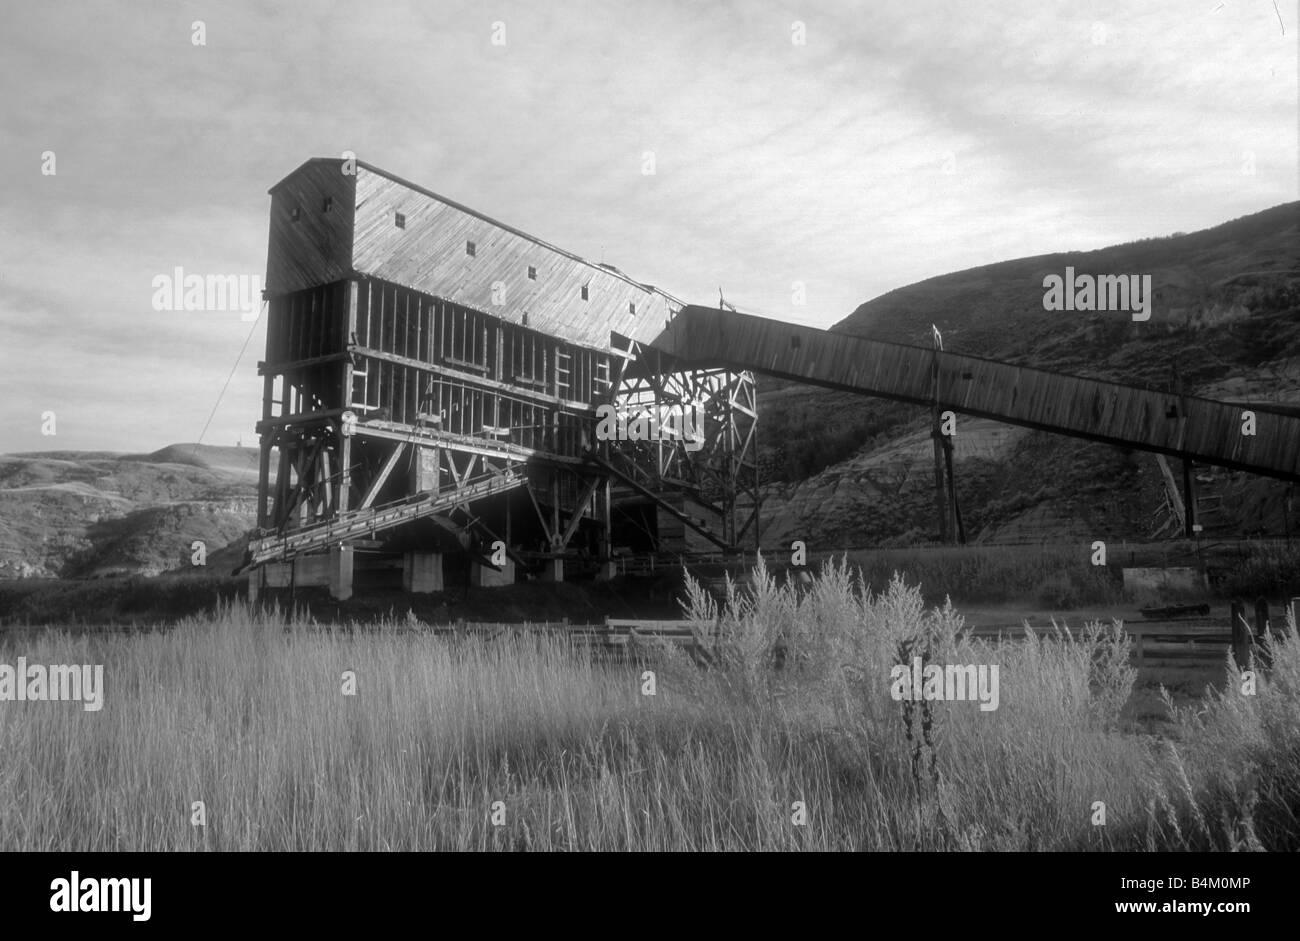 The historic tippler of Atlas Coal Mines, Drumheller AB - Stock Image